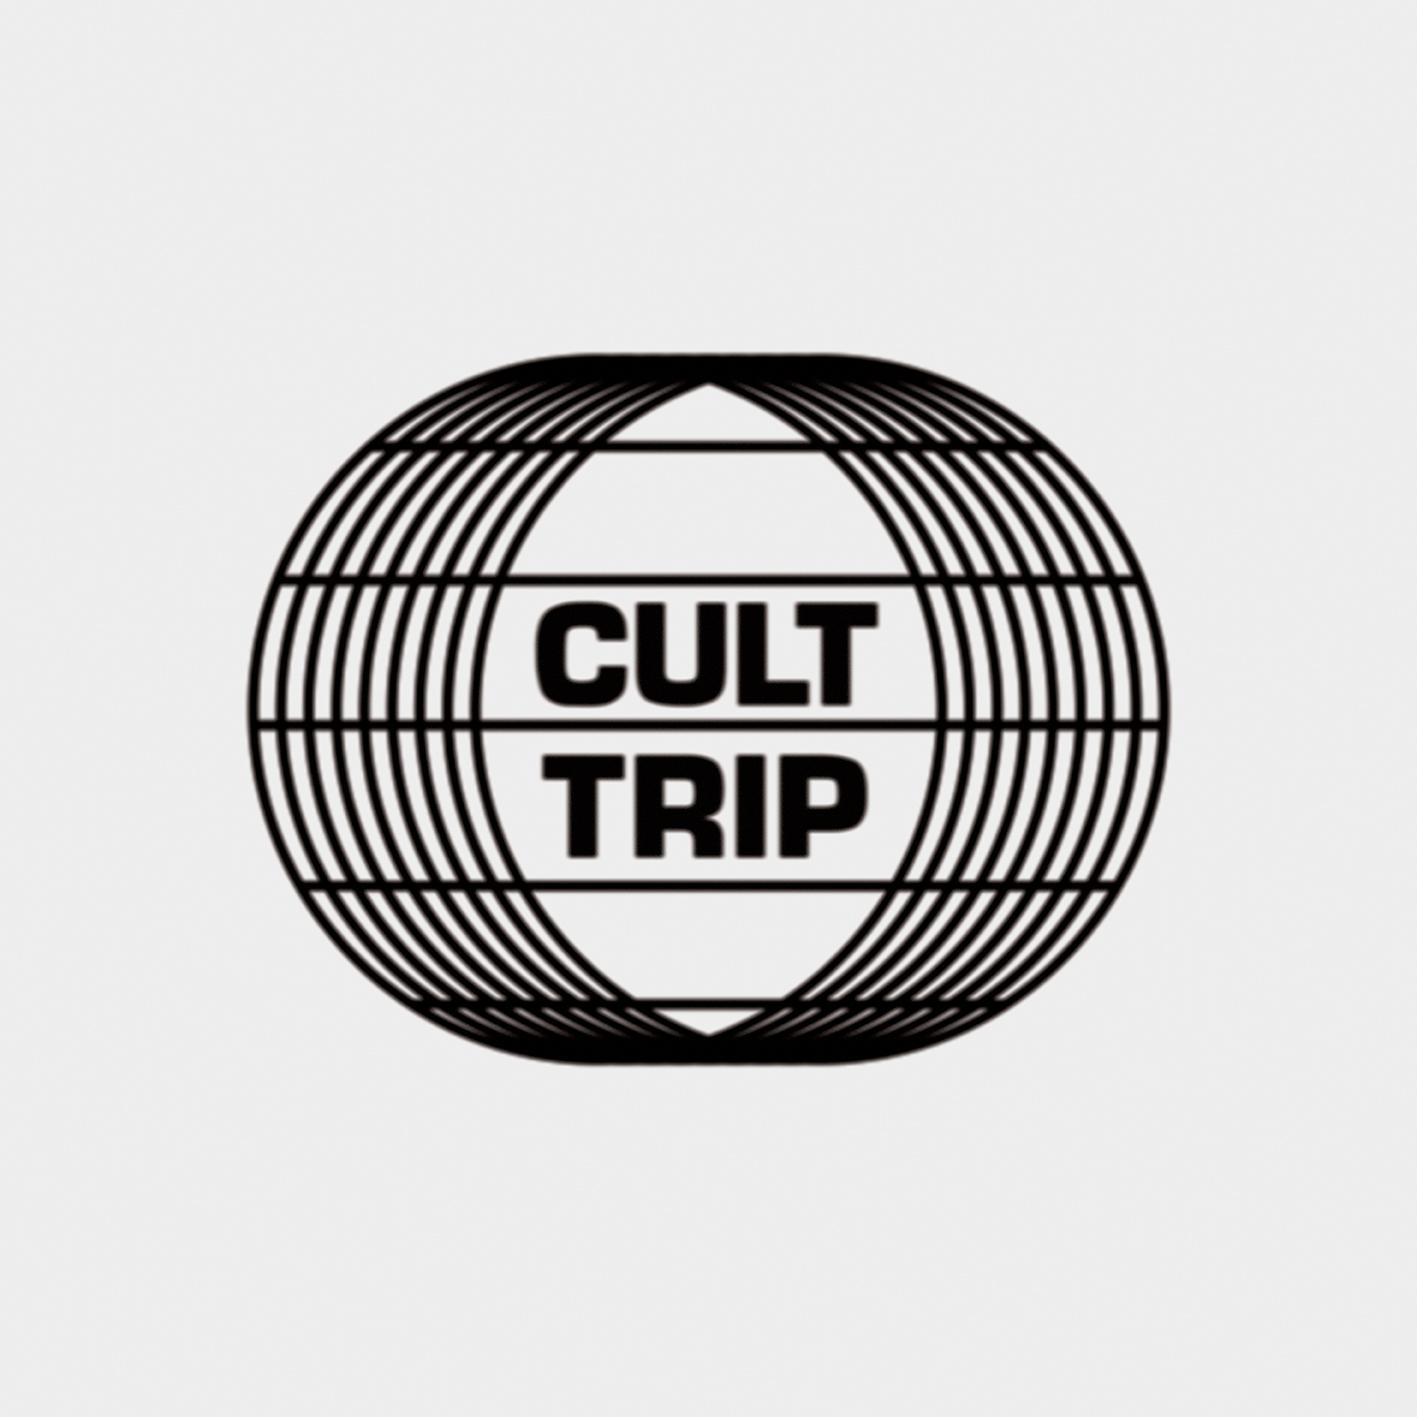 2200 – Killed By Death (Cult Trip)